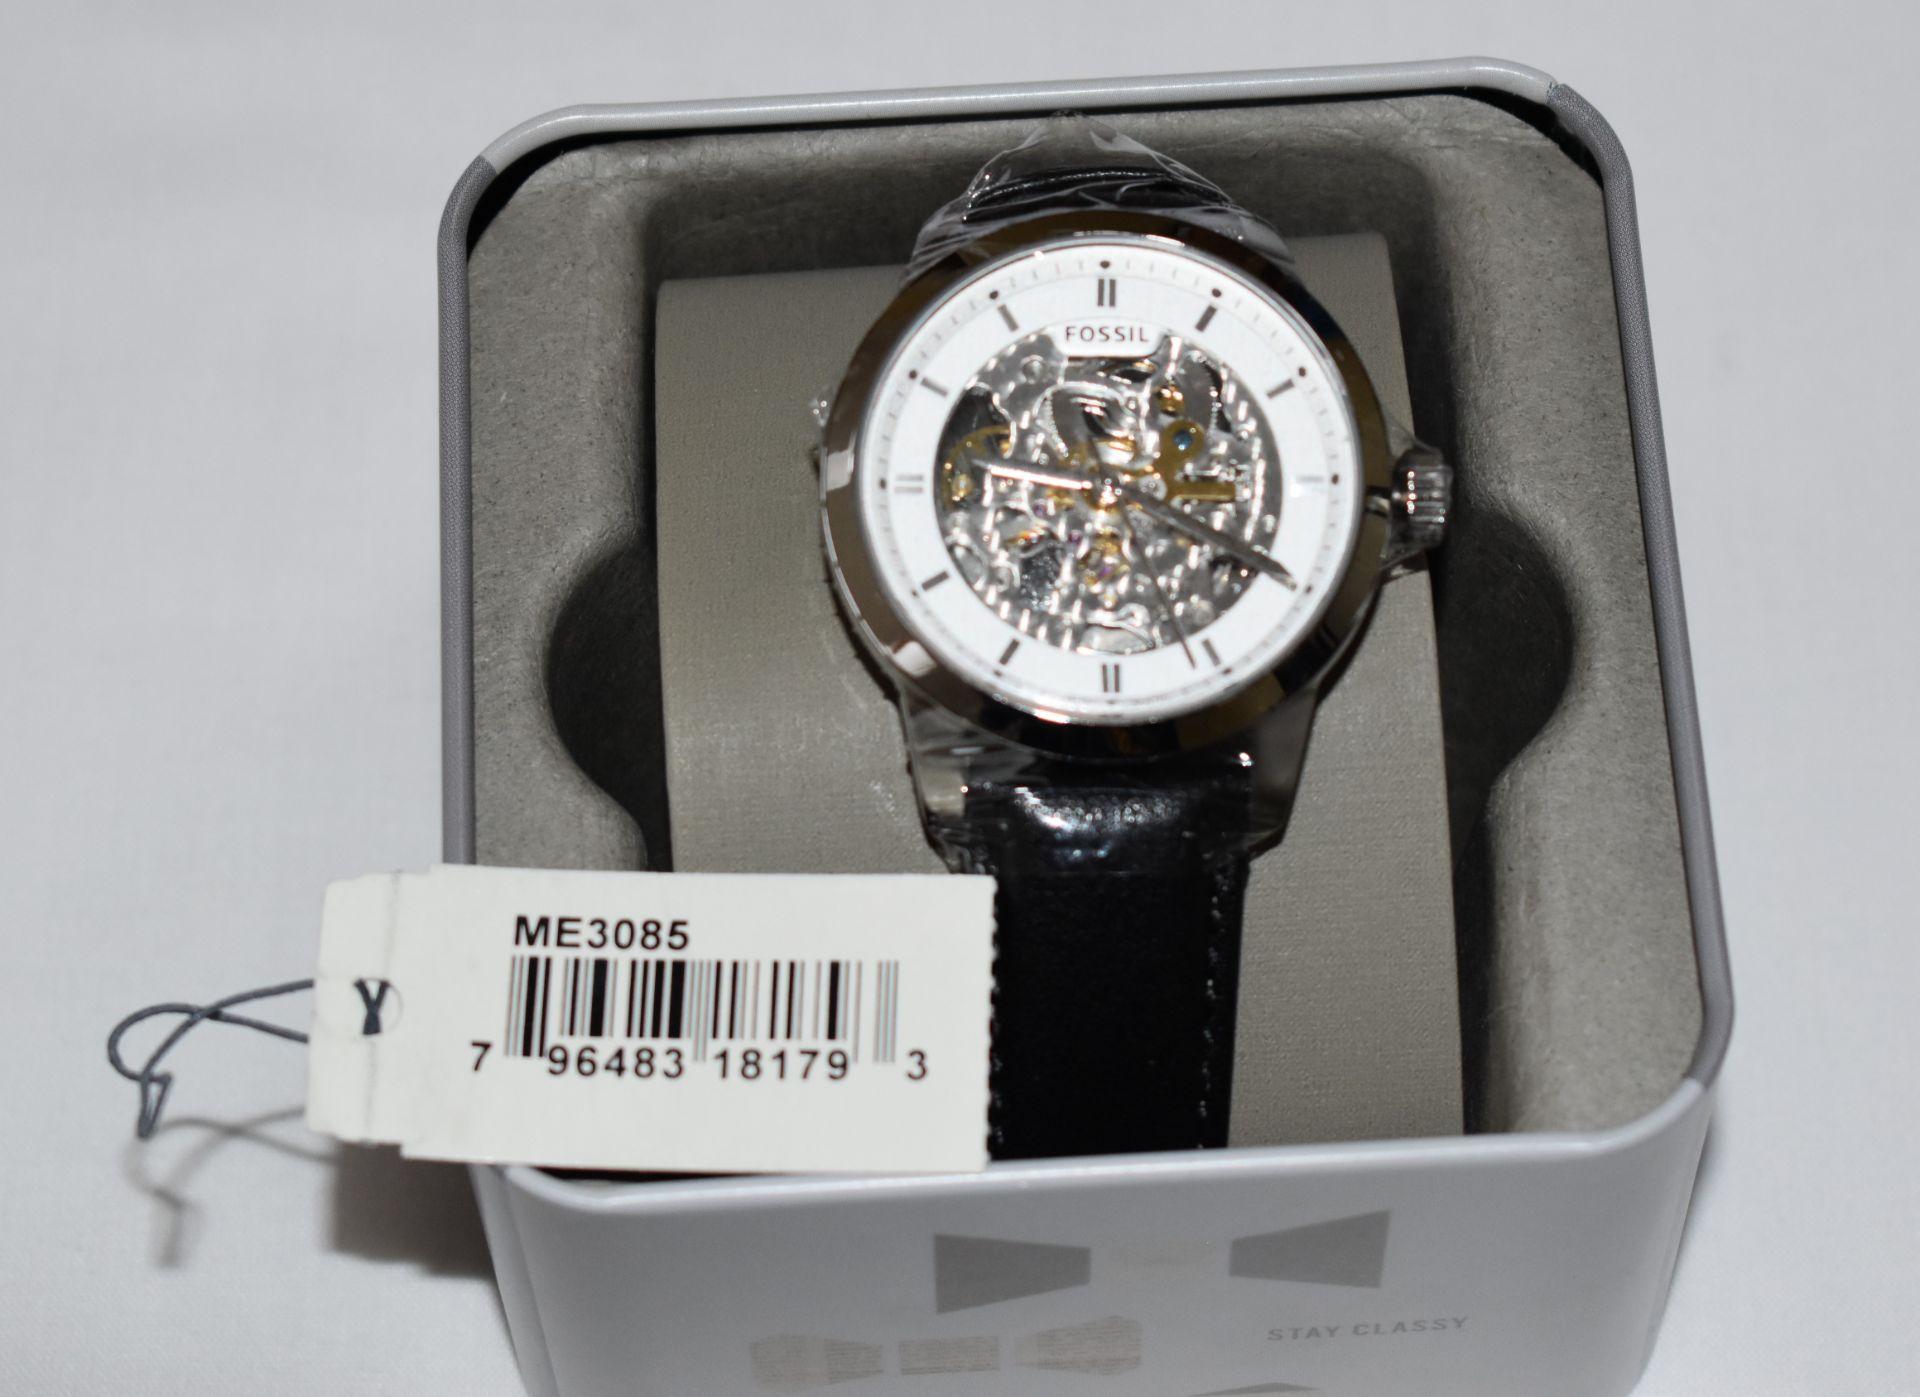 Fossil Men's Watch ME3085